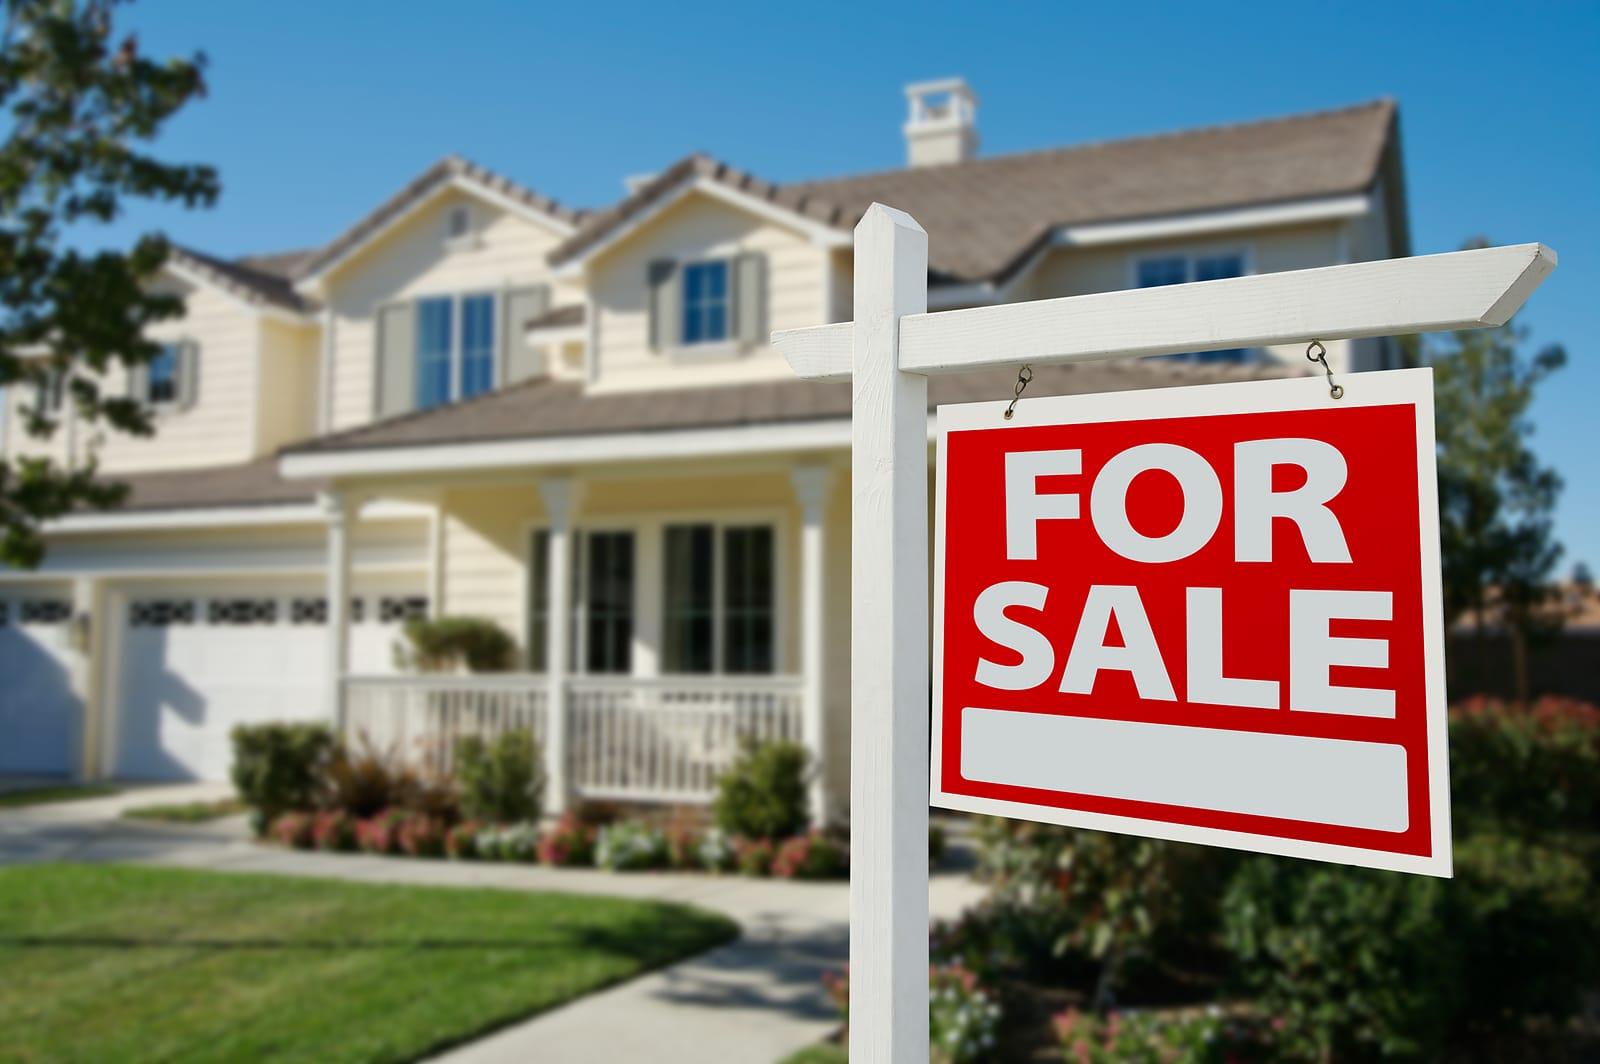 real-estate-photo-min0DB36CB3-21E8-7618-A849-CD9A982BF56D.jpg